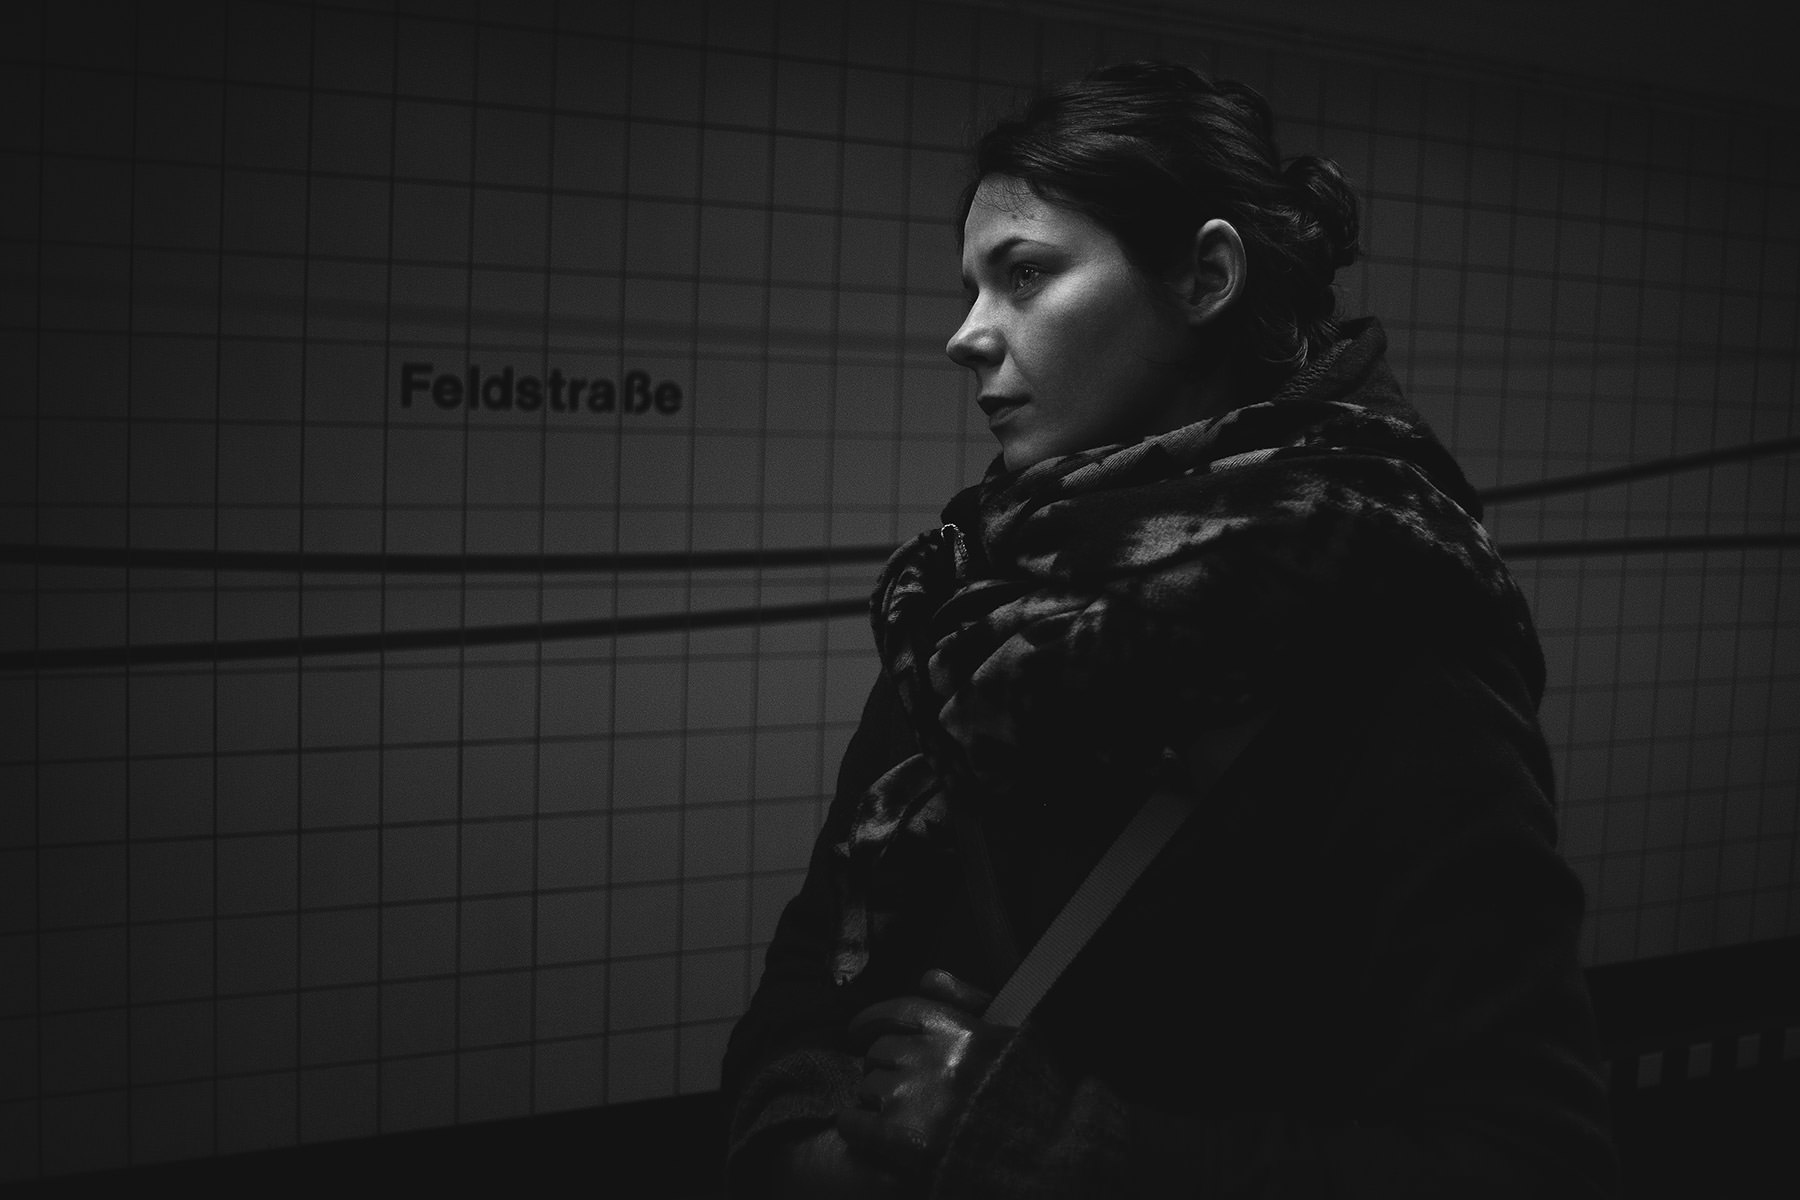 daniel_pelka_alana_portrait01